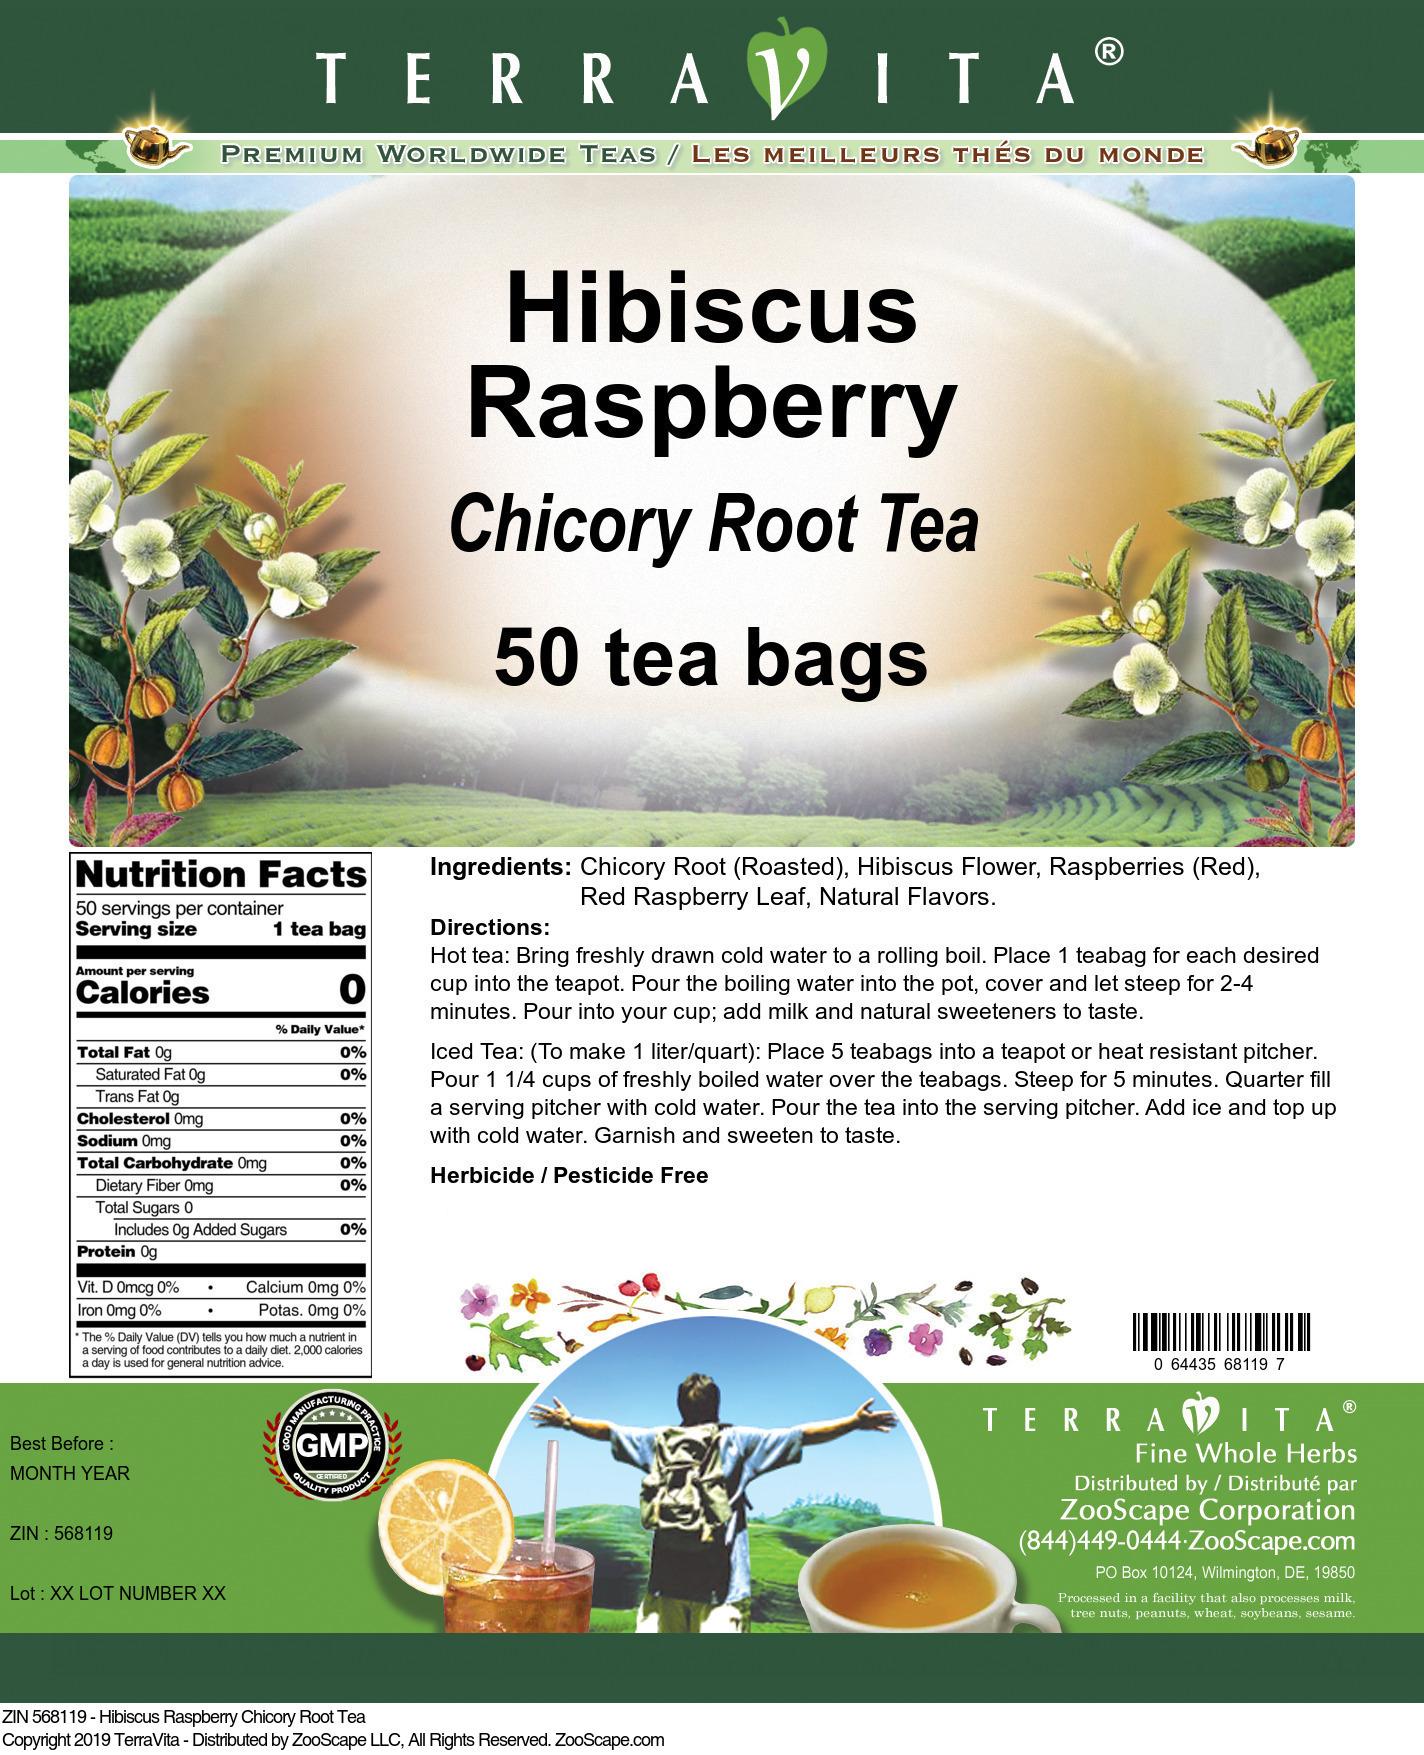 Hibiscus Raspberry Chicory Root Tea